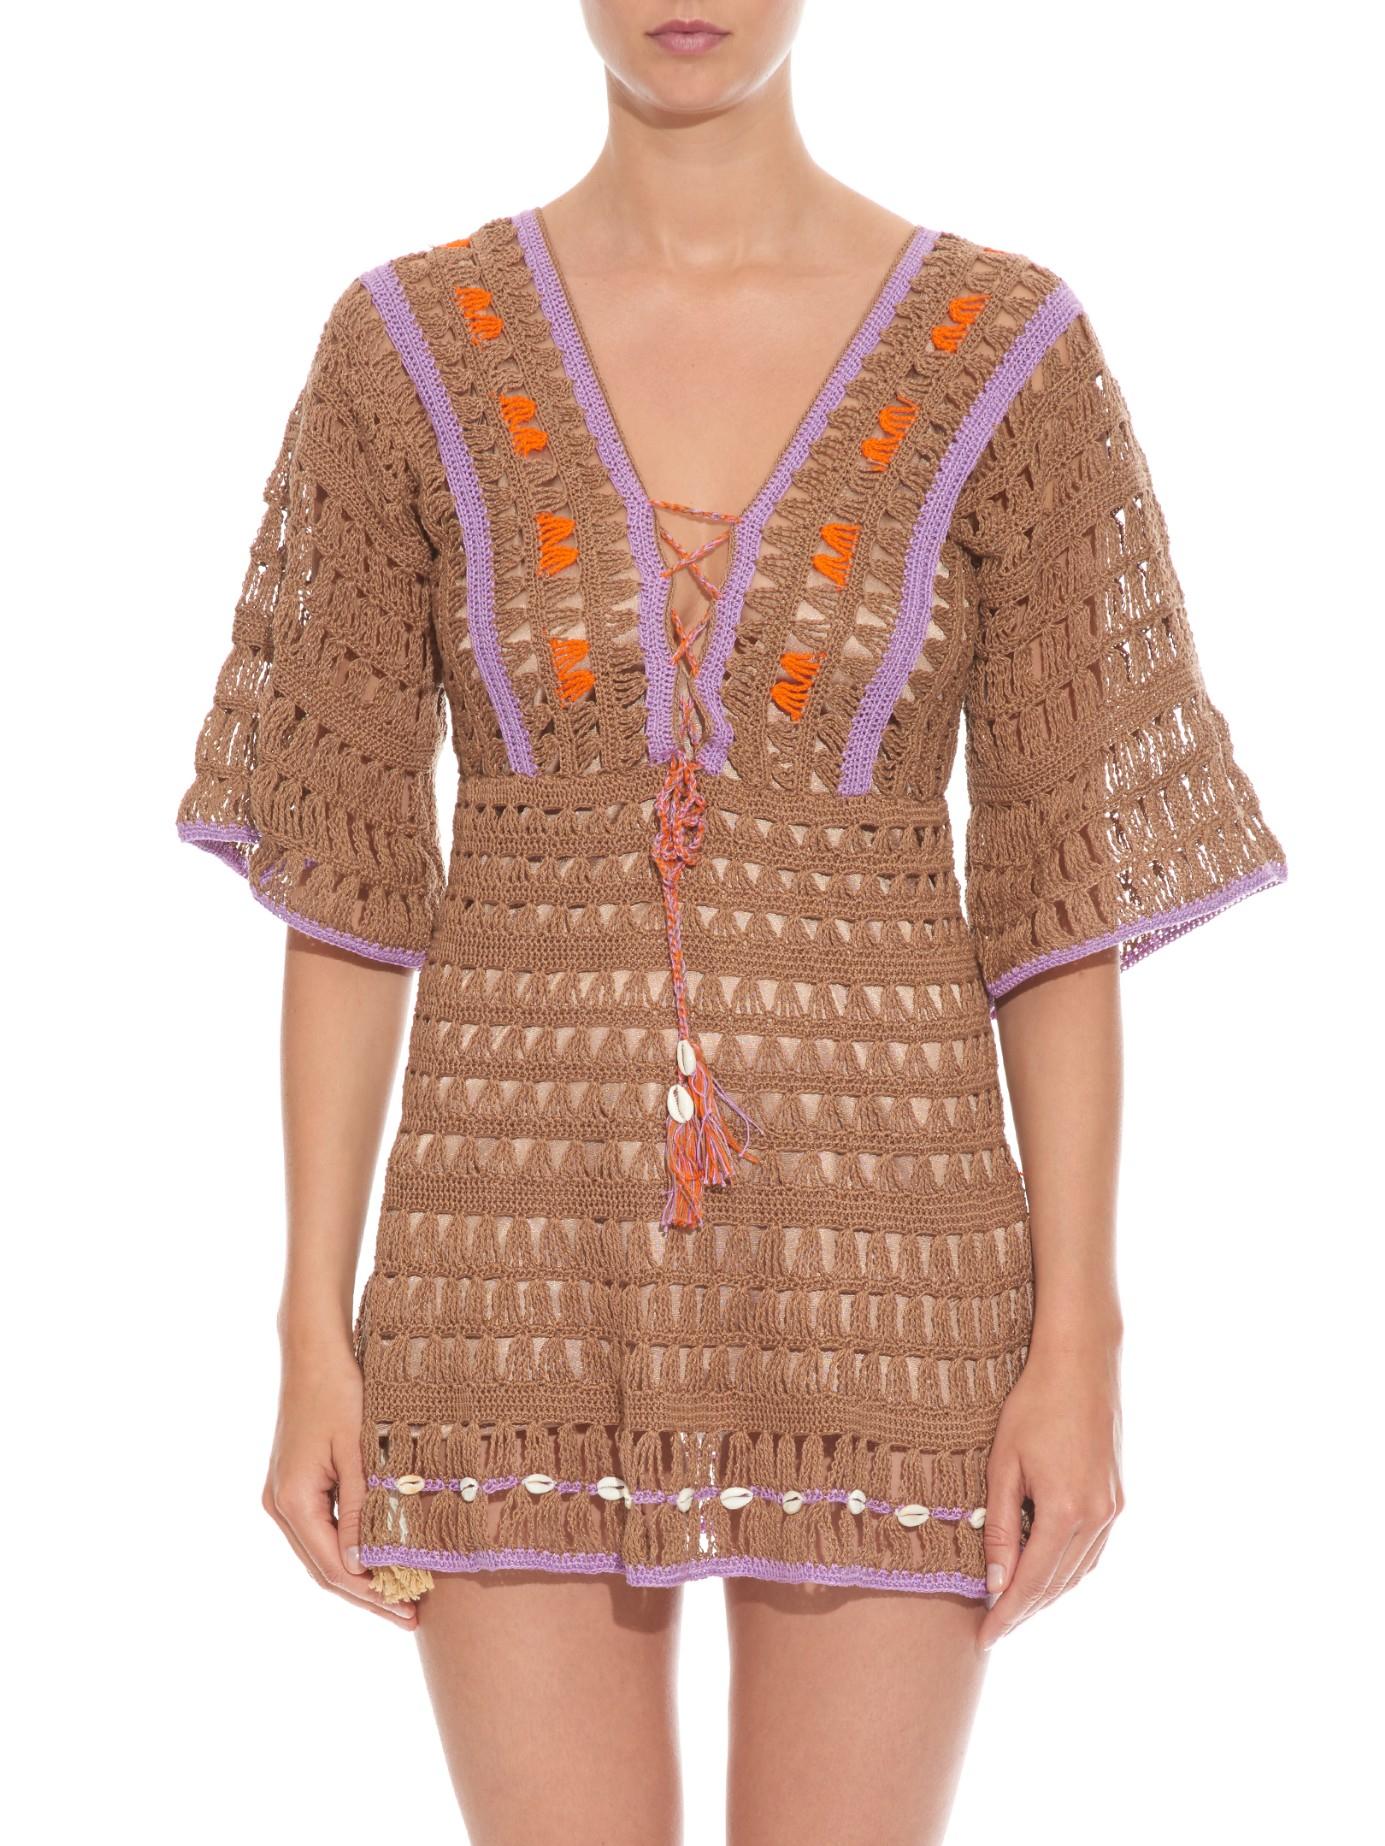 41e59e26b5e Anna Kosturova Medina Shell-embellished Crochet Dress in Brown - Lyst